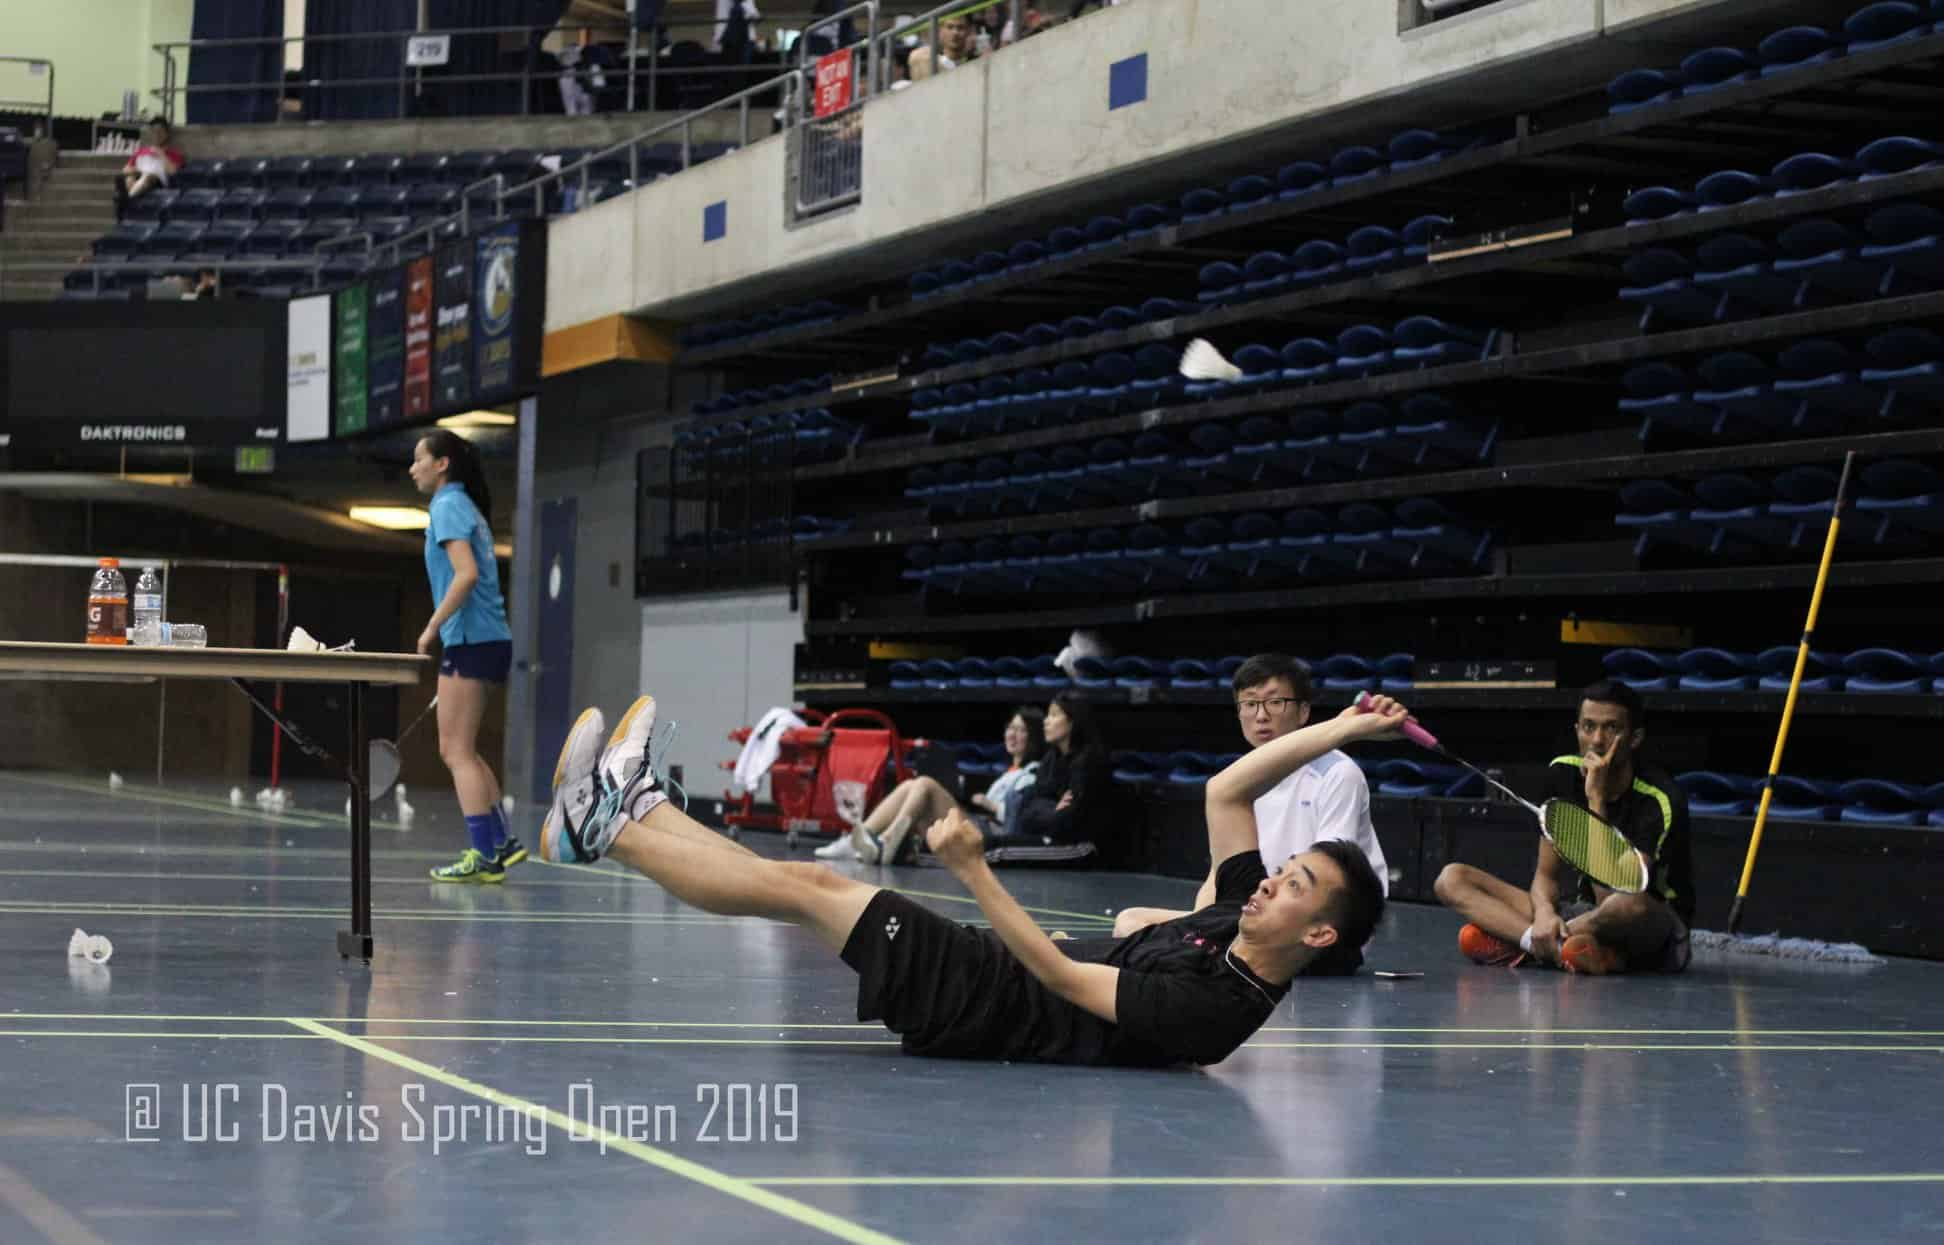 Justin Ma playing badminton